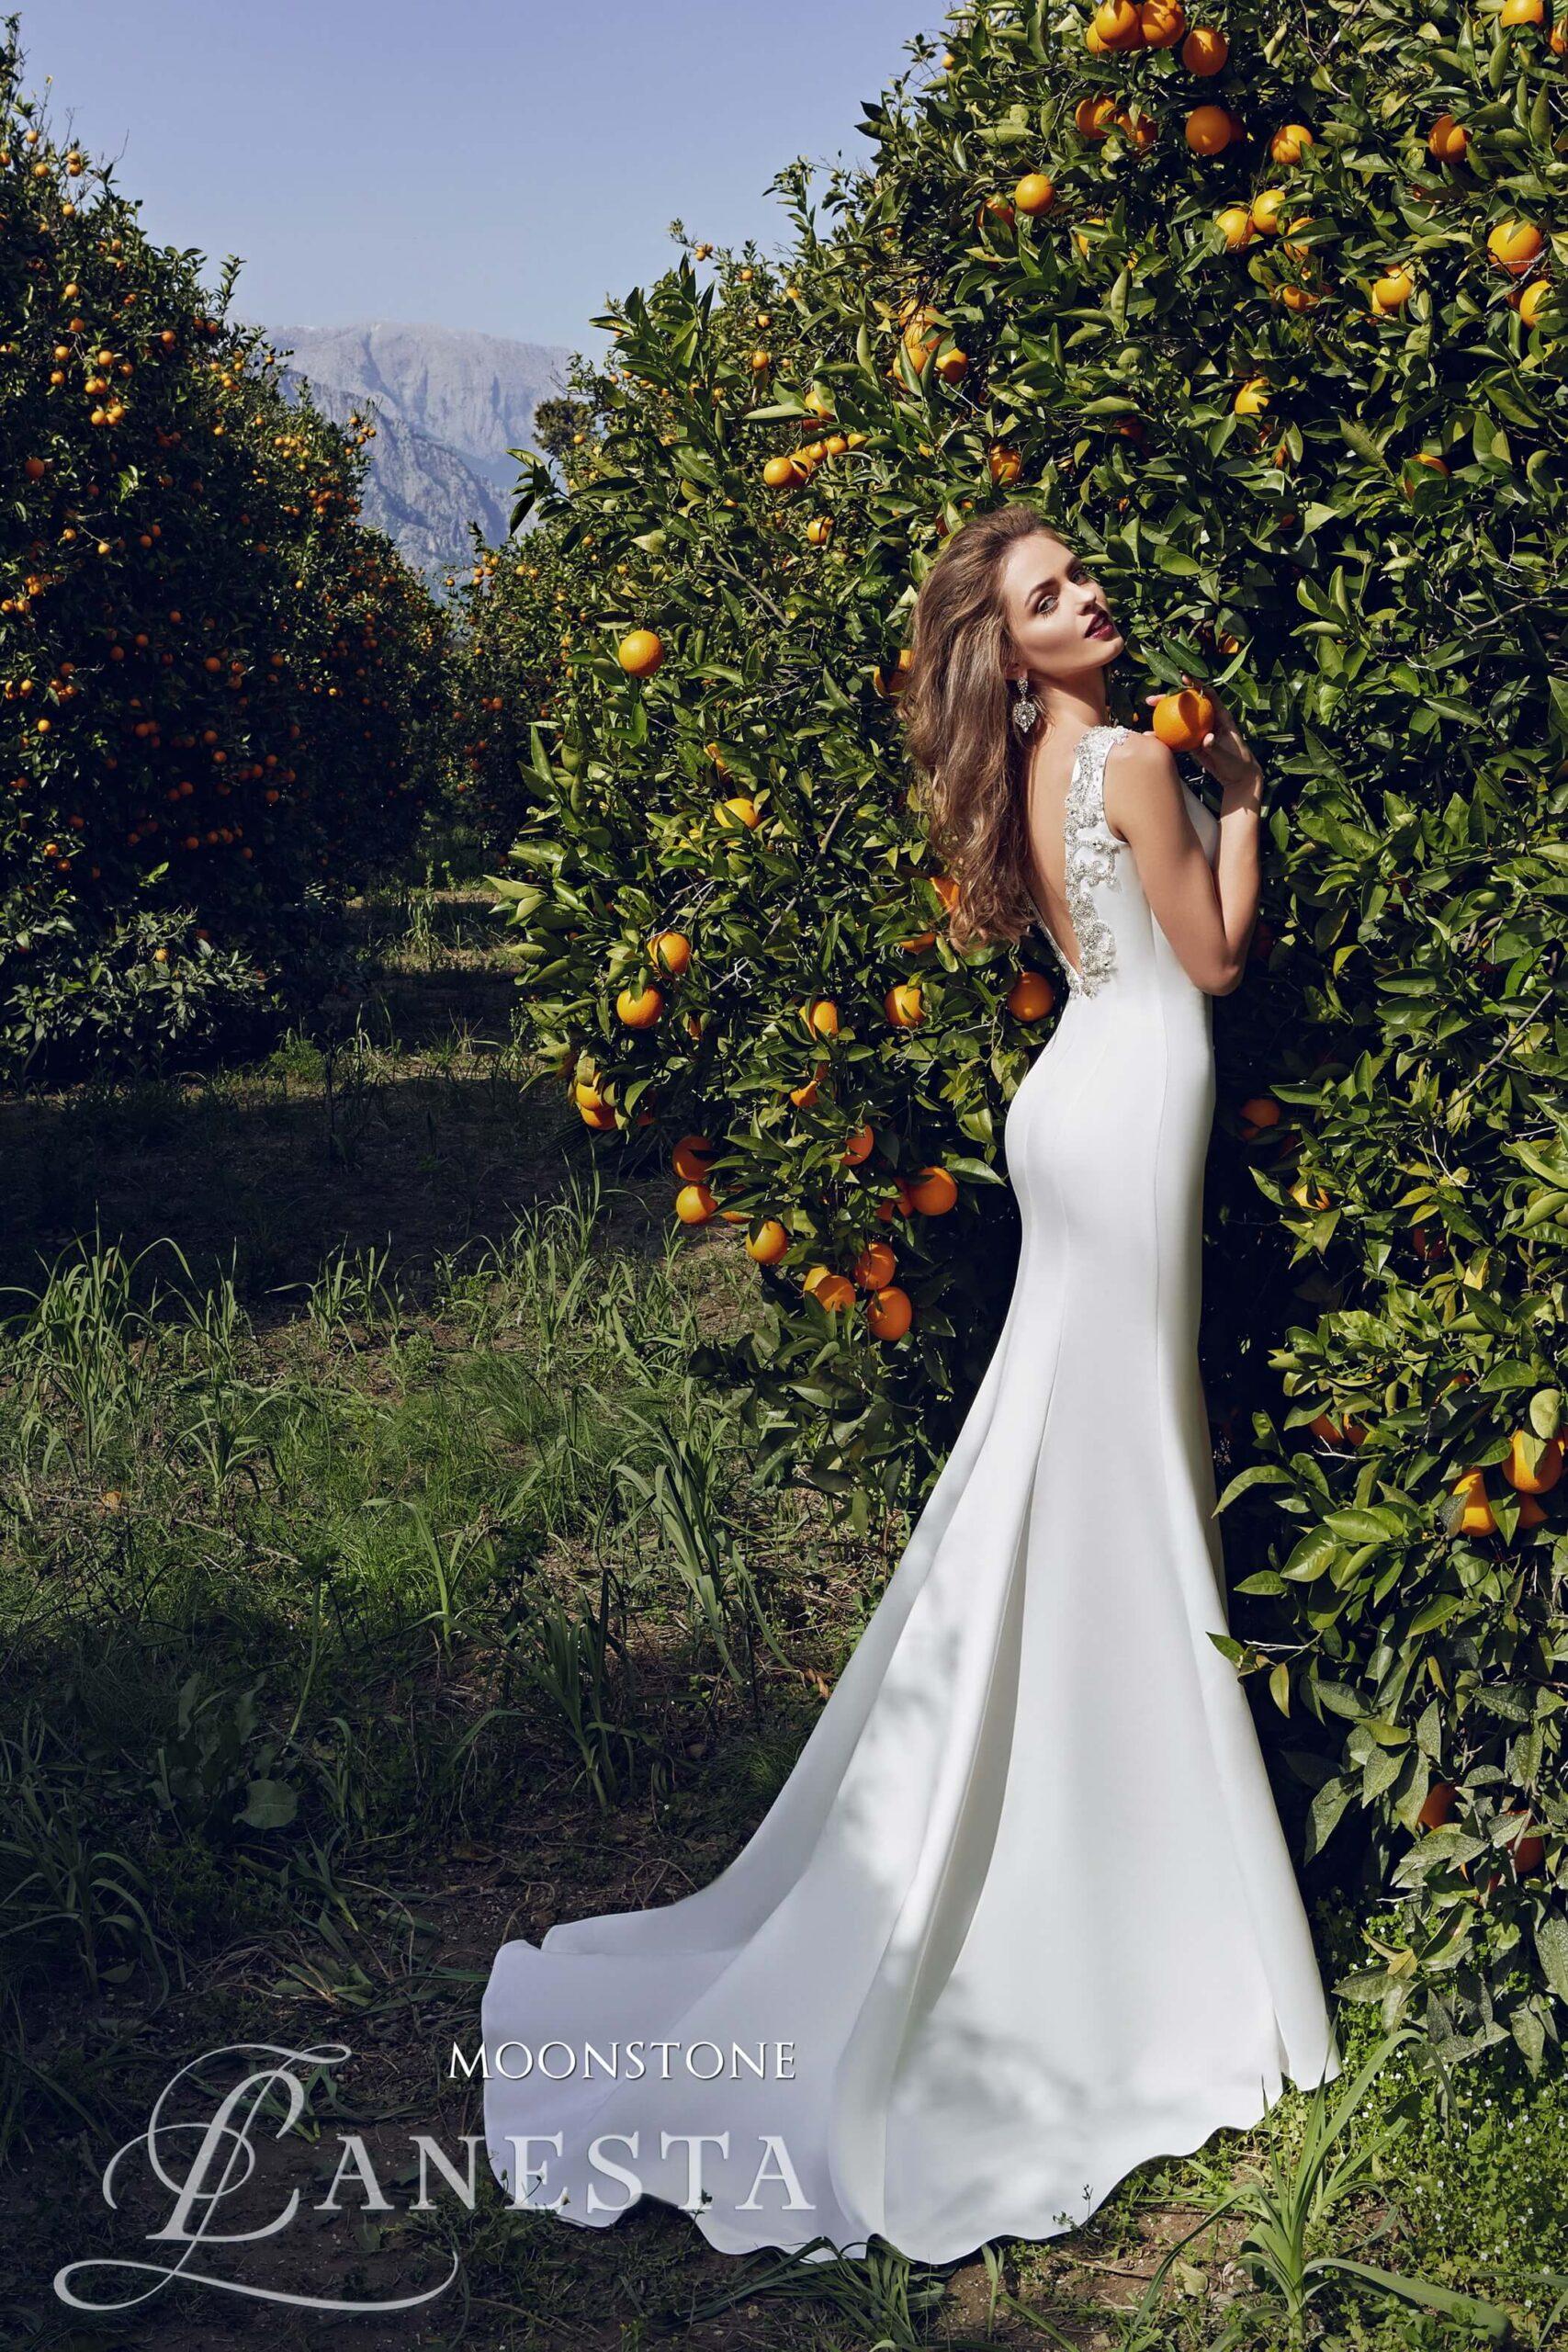 Весільна сукня Moonstone Lanesta